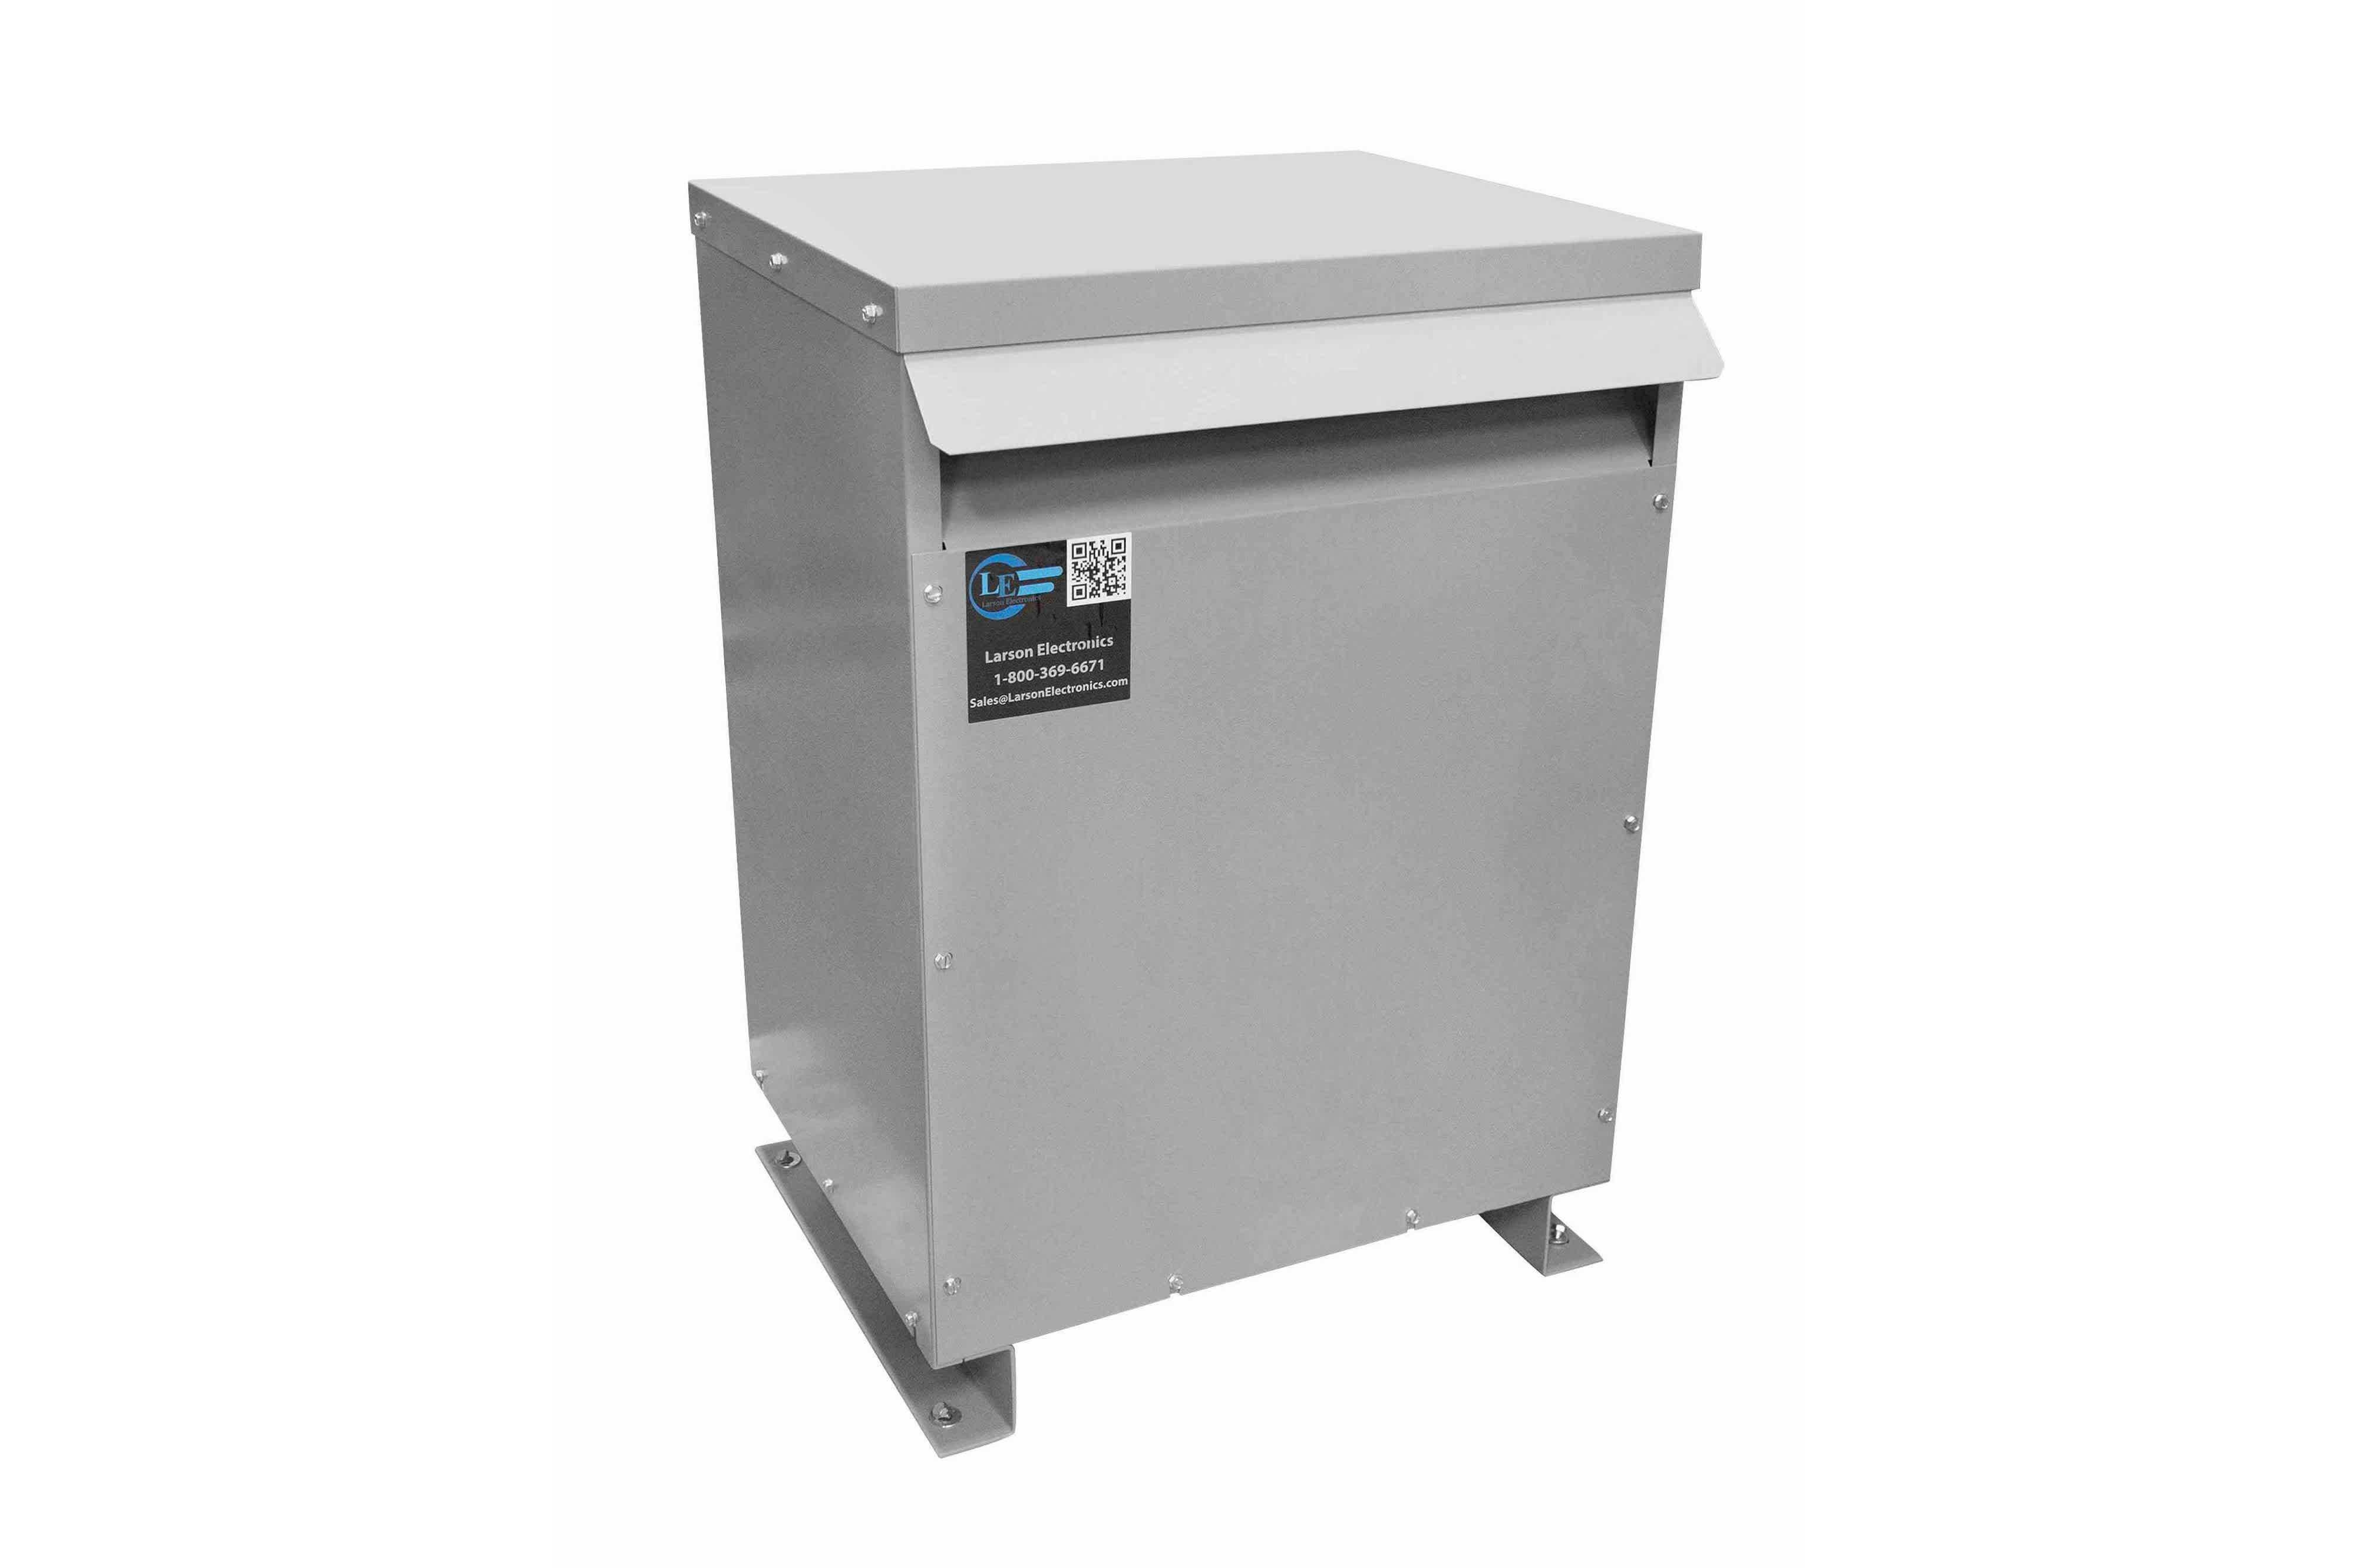 36 kVA 3PH Isolation Transformer, 415V Wye Primary, 208V Delta Secondary, N3R, Ventilated, 60 Hz